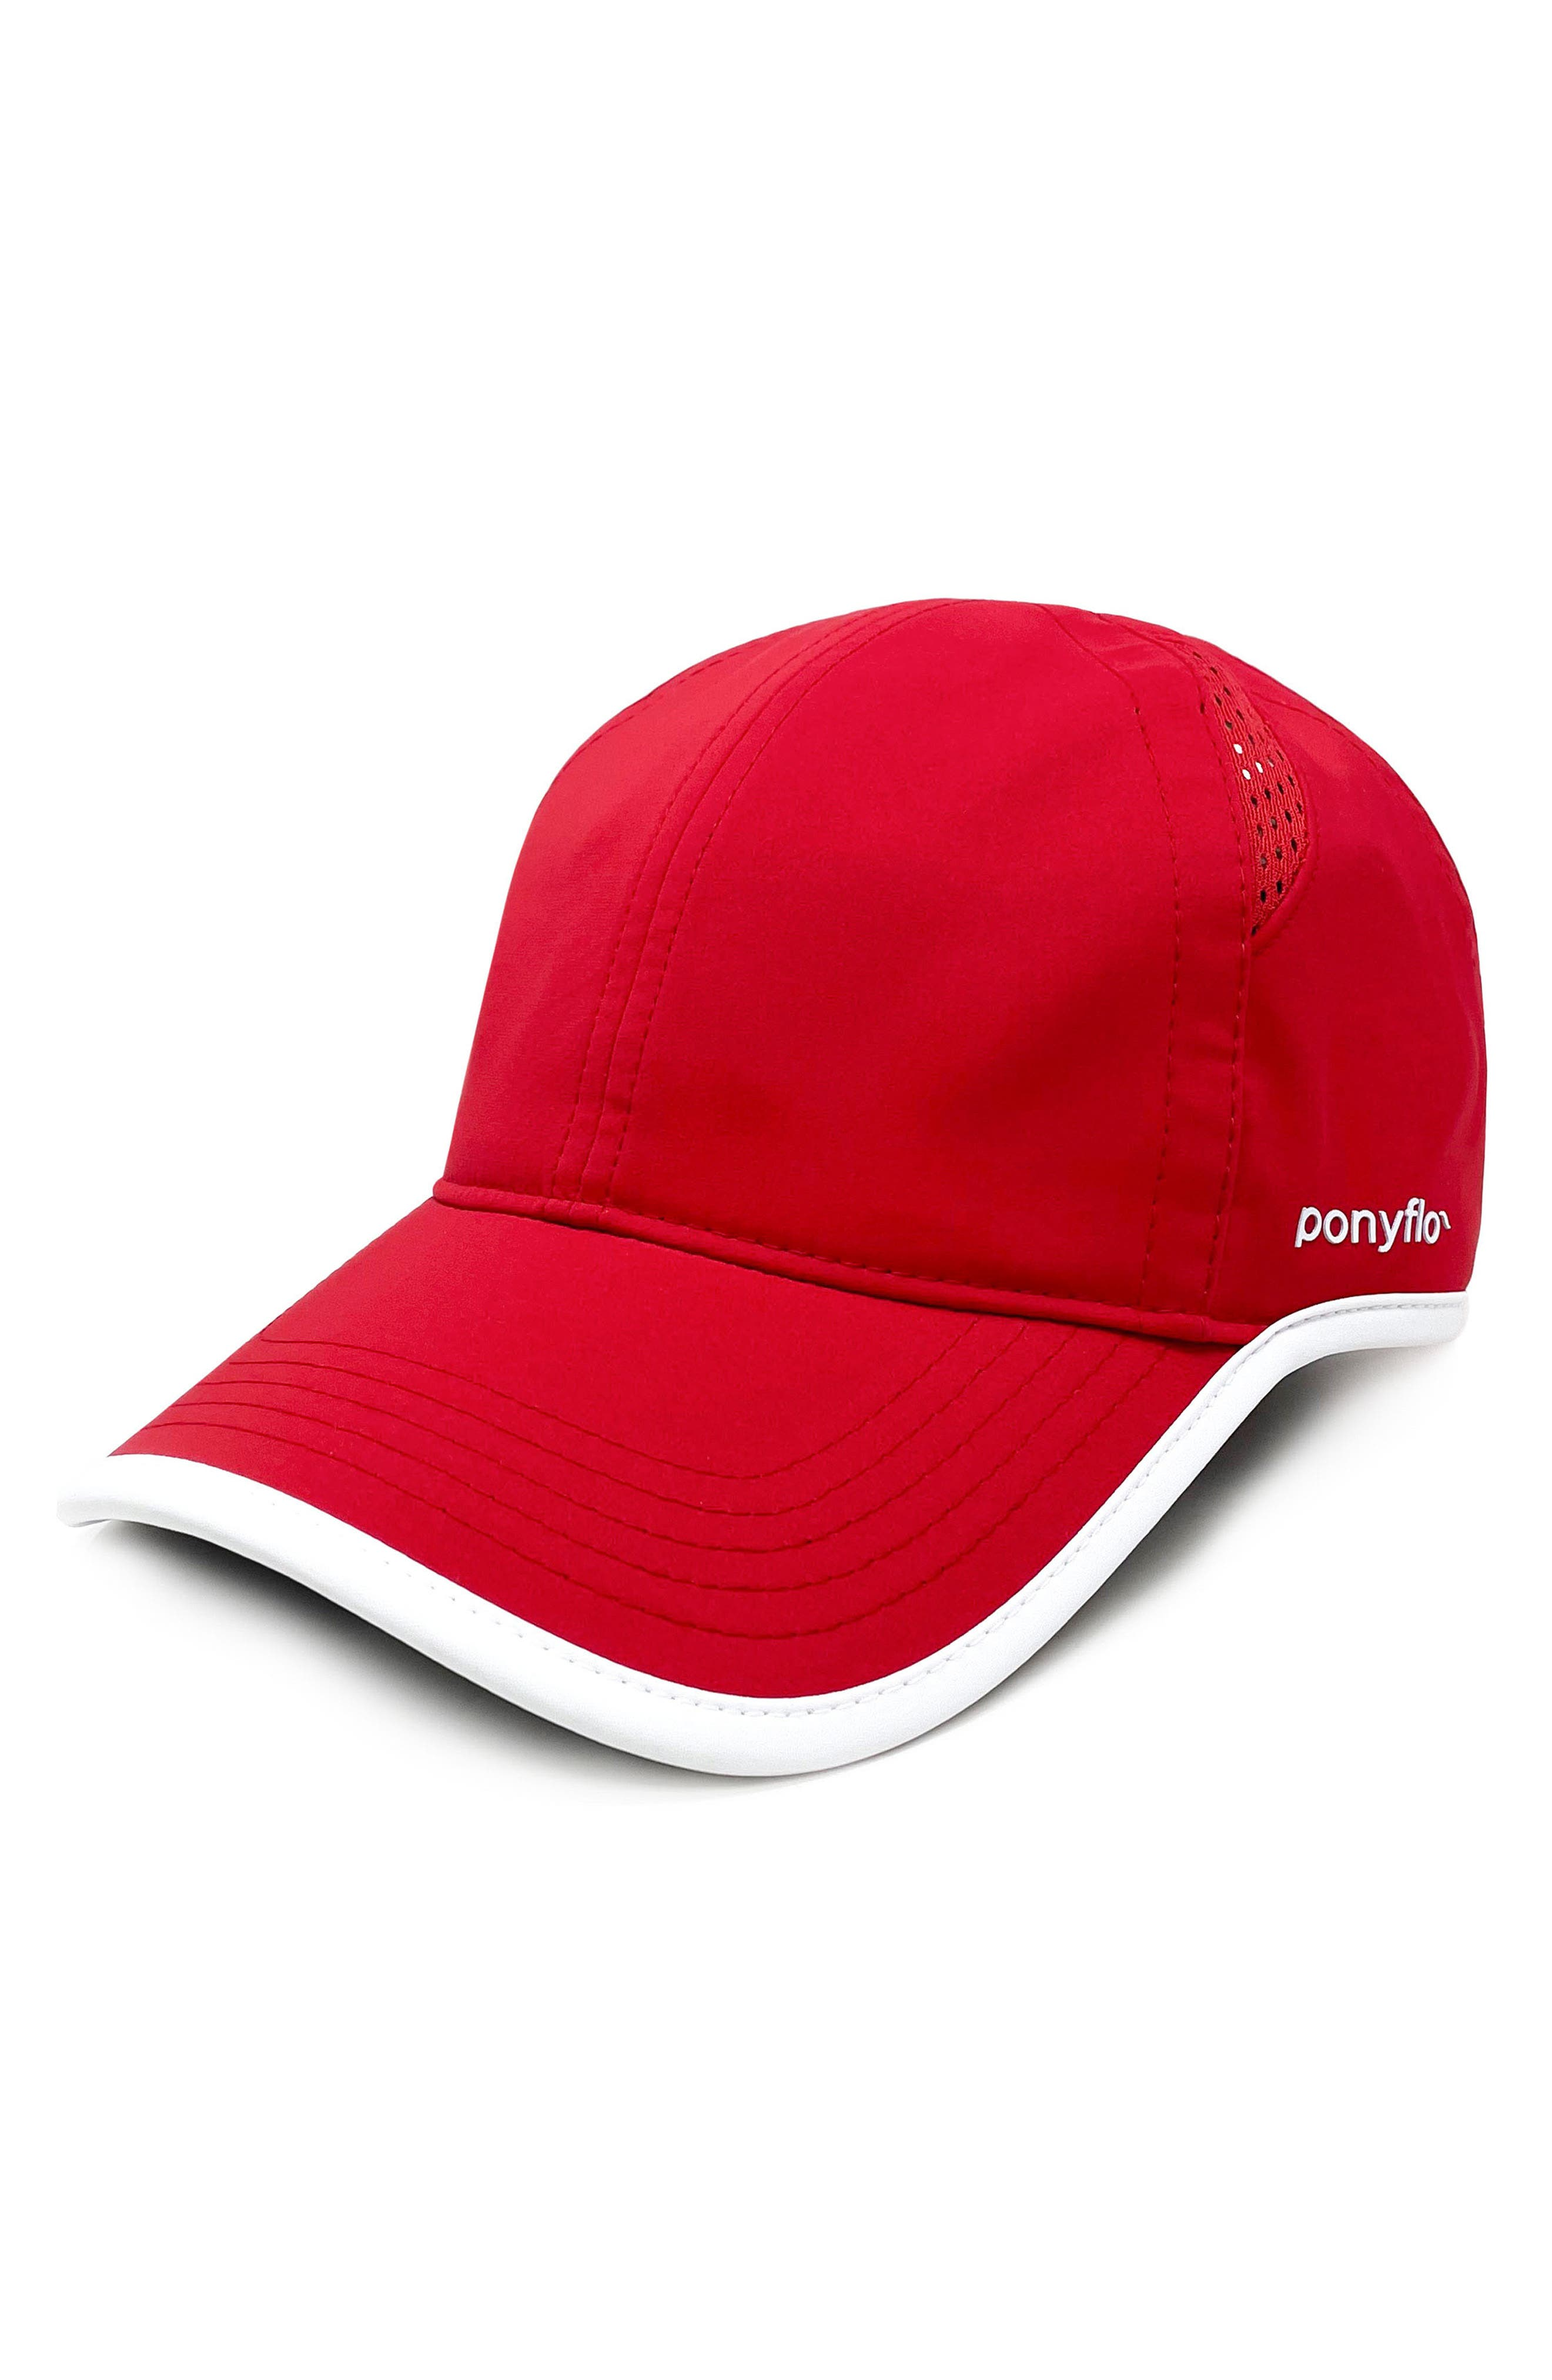 Zena Water Resistant Ponyflo Cap